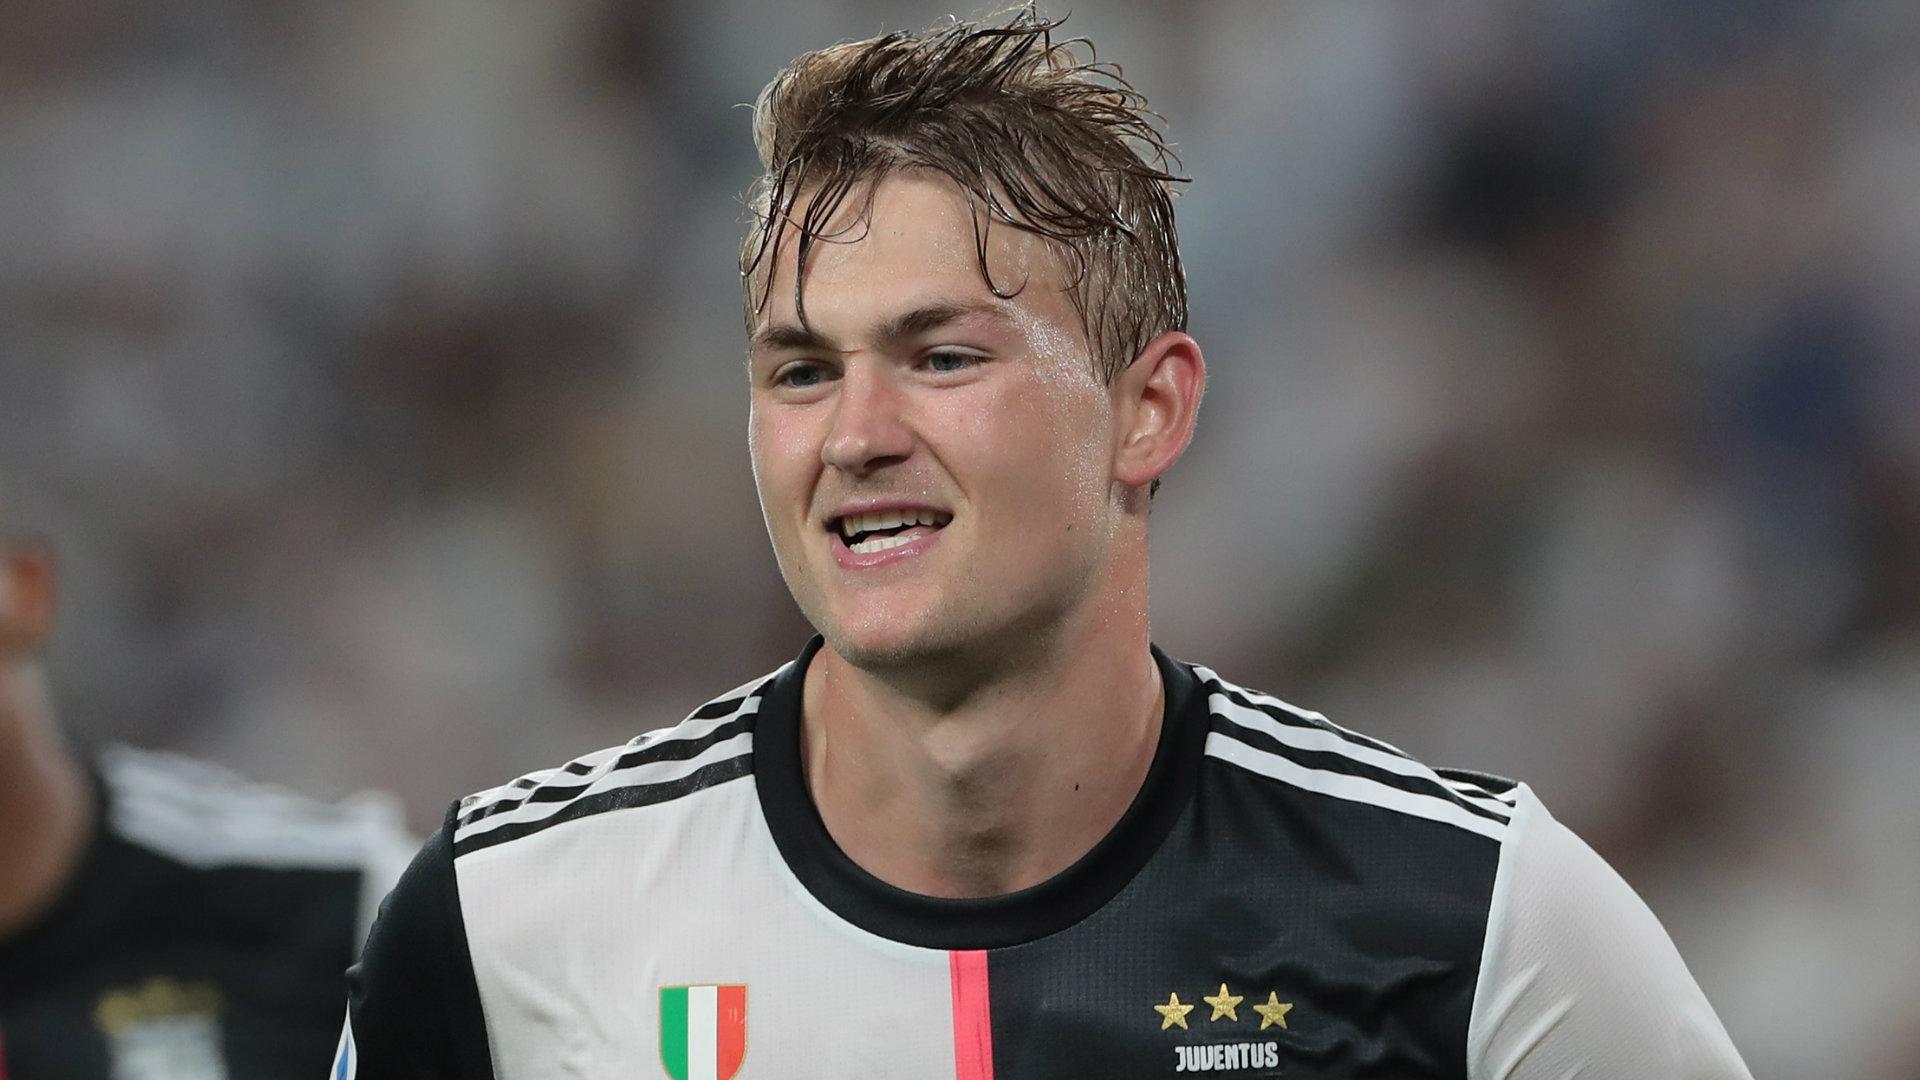 'He always stays calm' - Van Dijk backs de Ligt following shaky Juve start